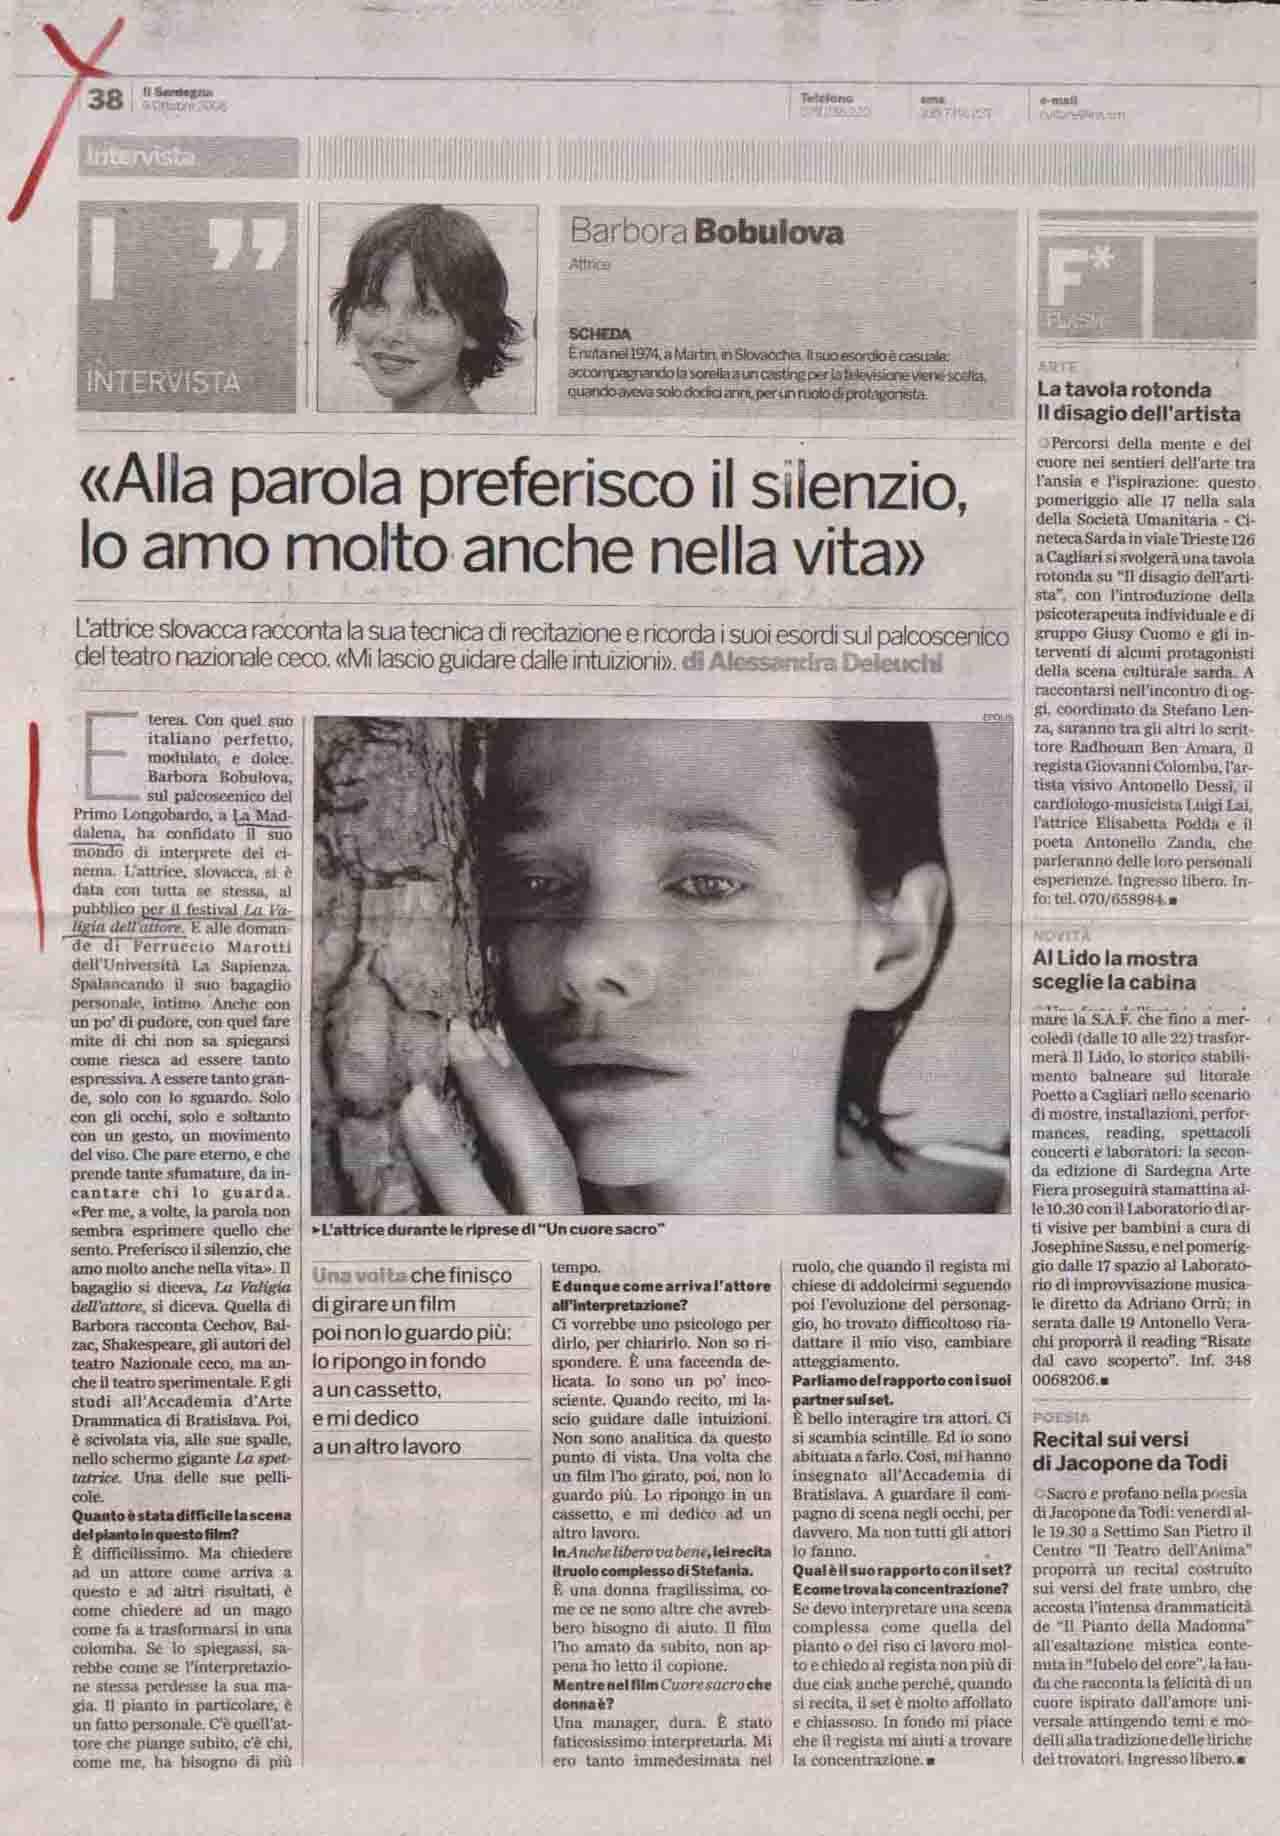 Il Sardegna (culture) 9 ott 2006